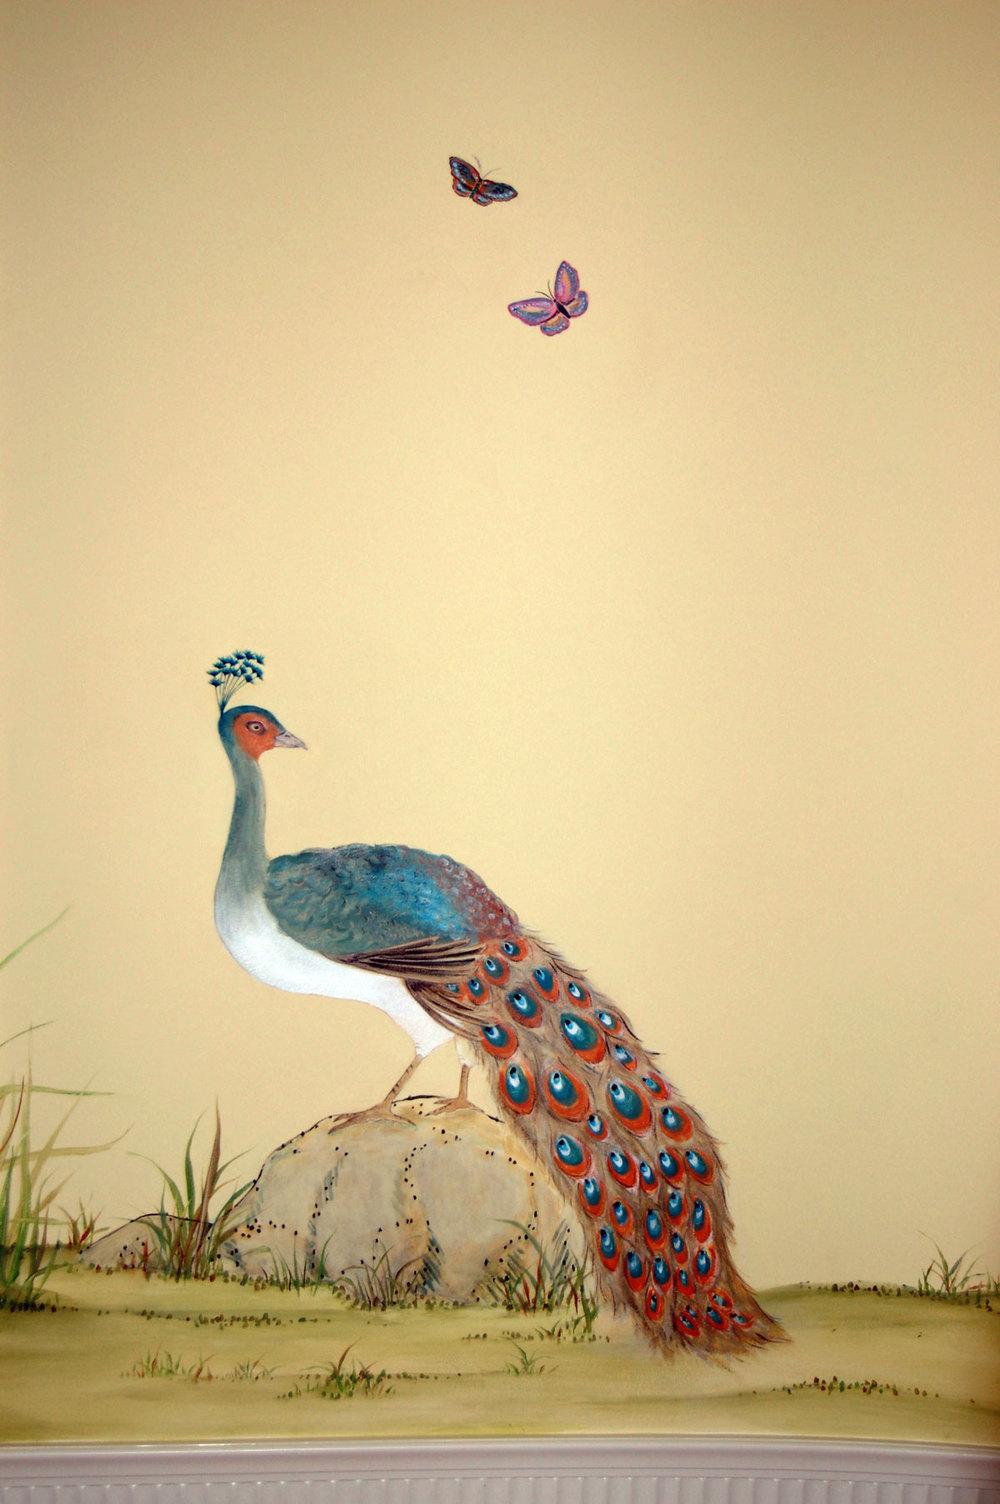 chinese-mural-peacock.jpg